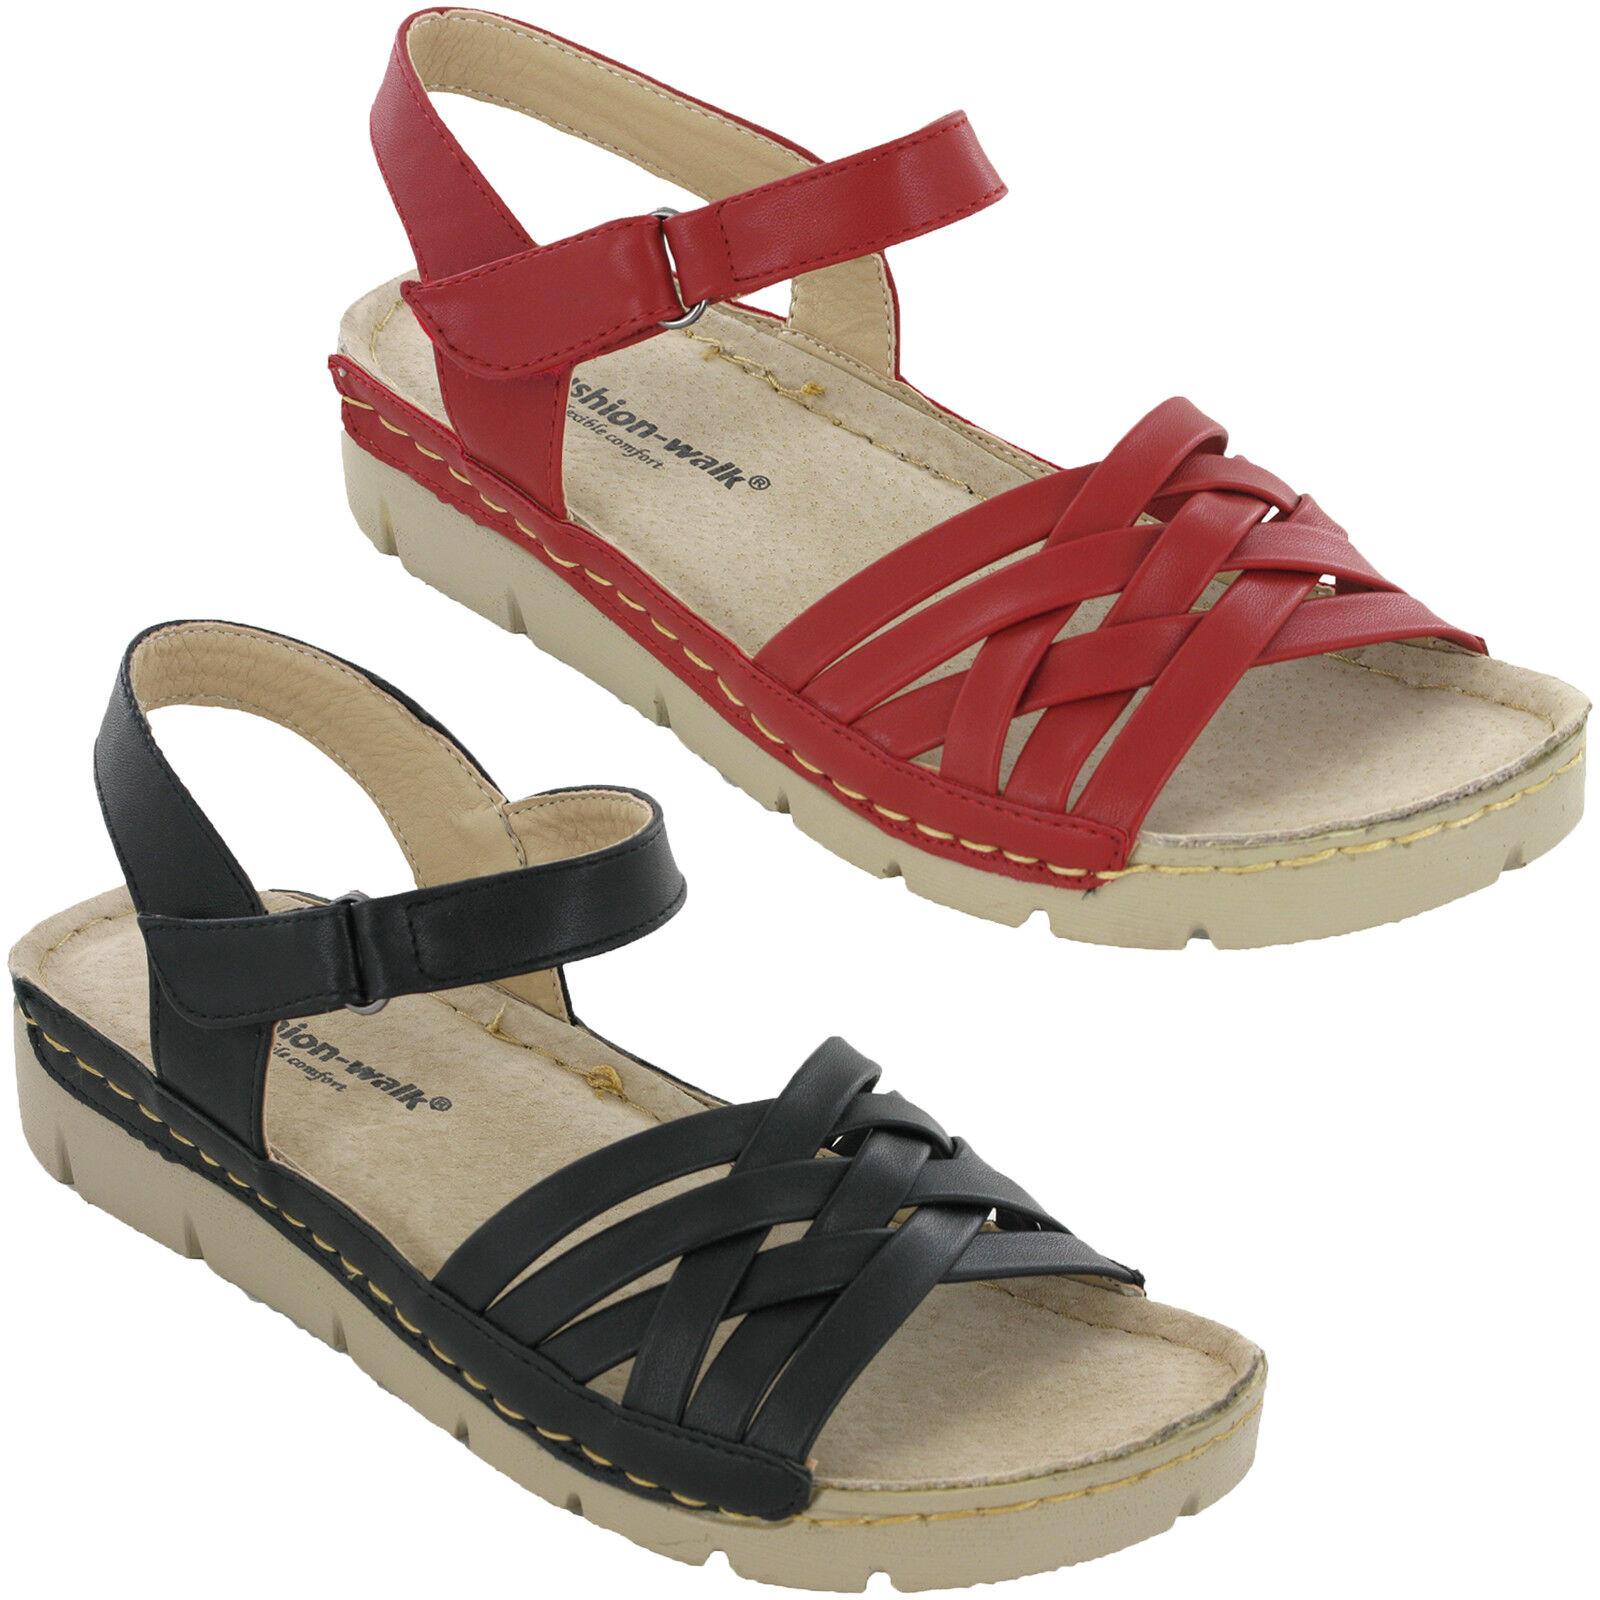 Cushion-Walk Platform Slingback Sandals Leather Lined Flat Womens Ankle Buckle